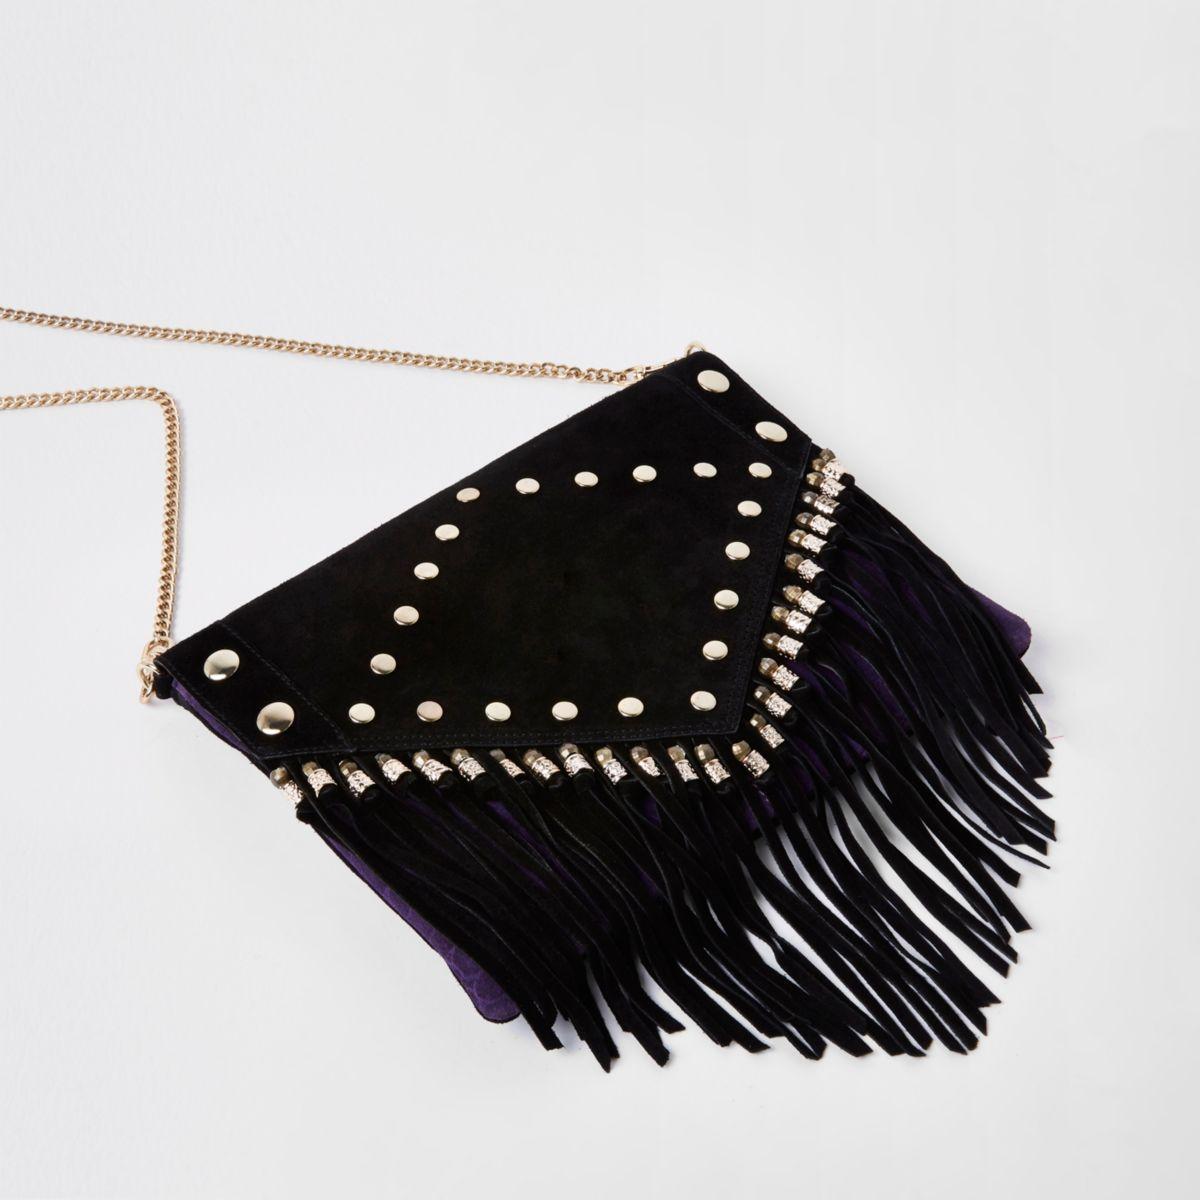 Black leather stud and tassel clutch bag